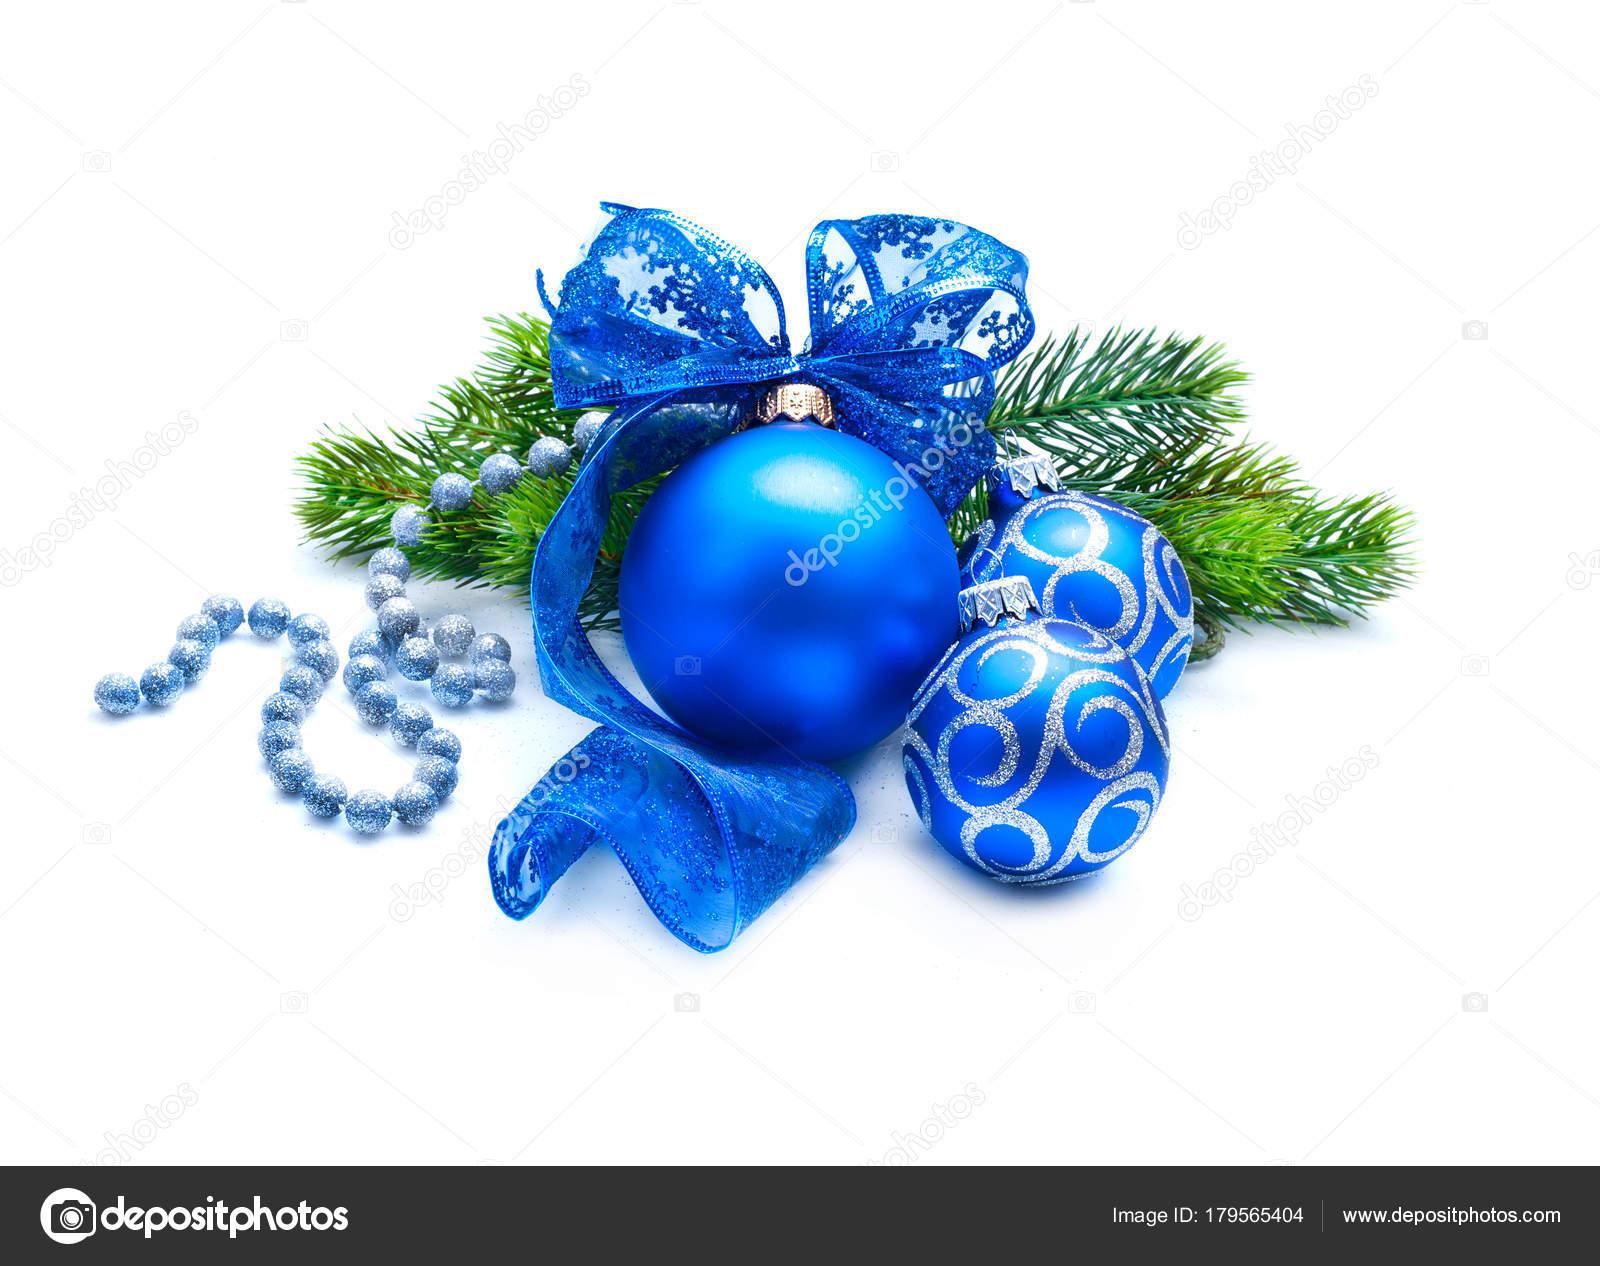 Bleu Boules Decoration Noel Avec Branche Sapin Ruban Sur Fond